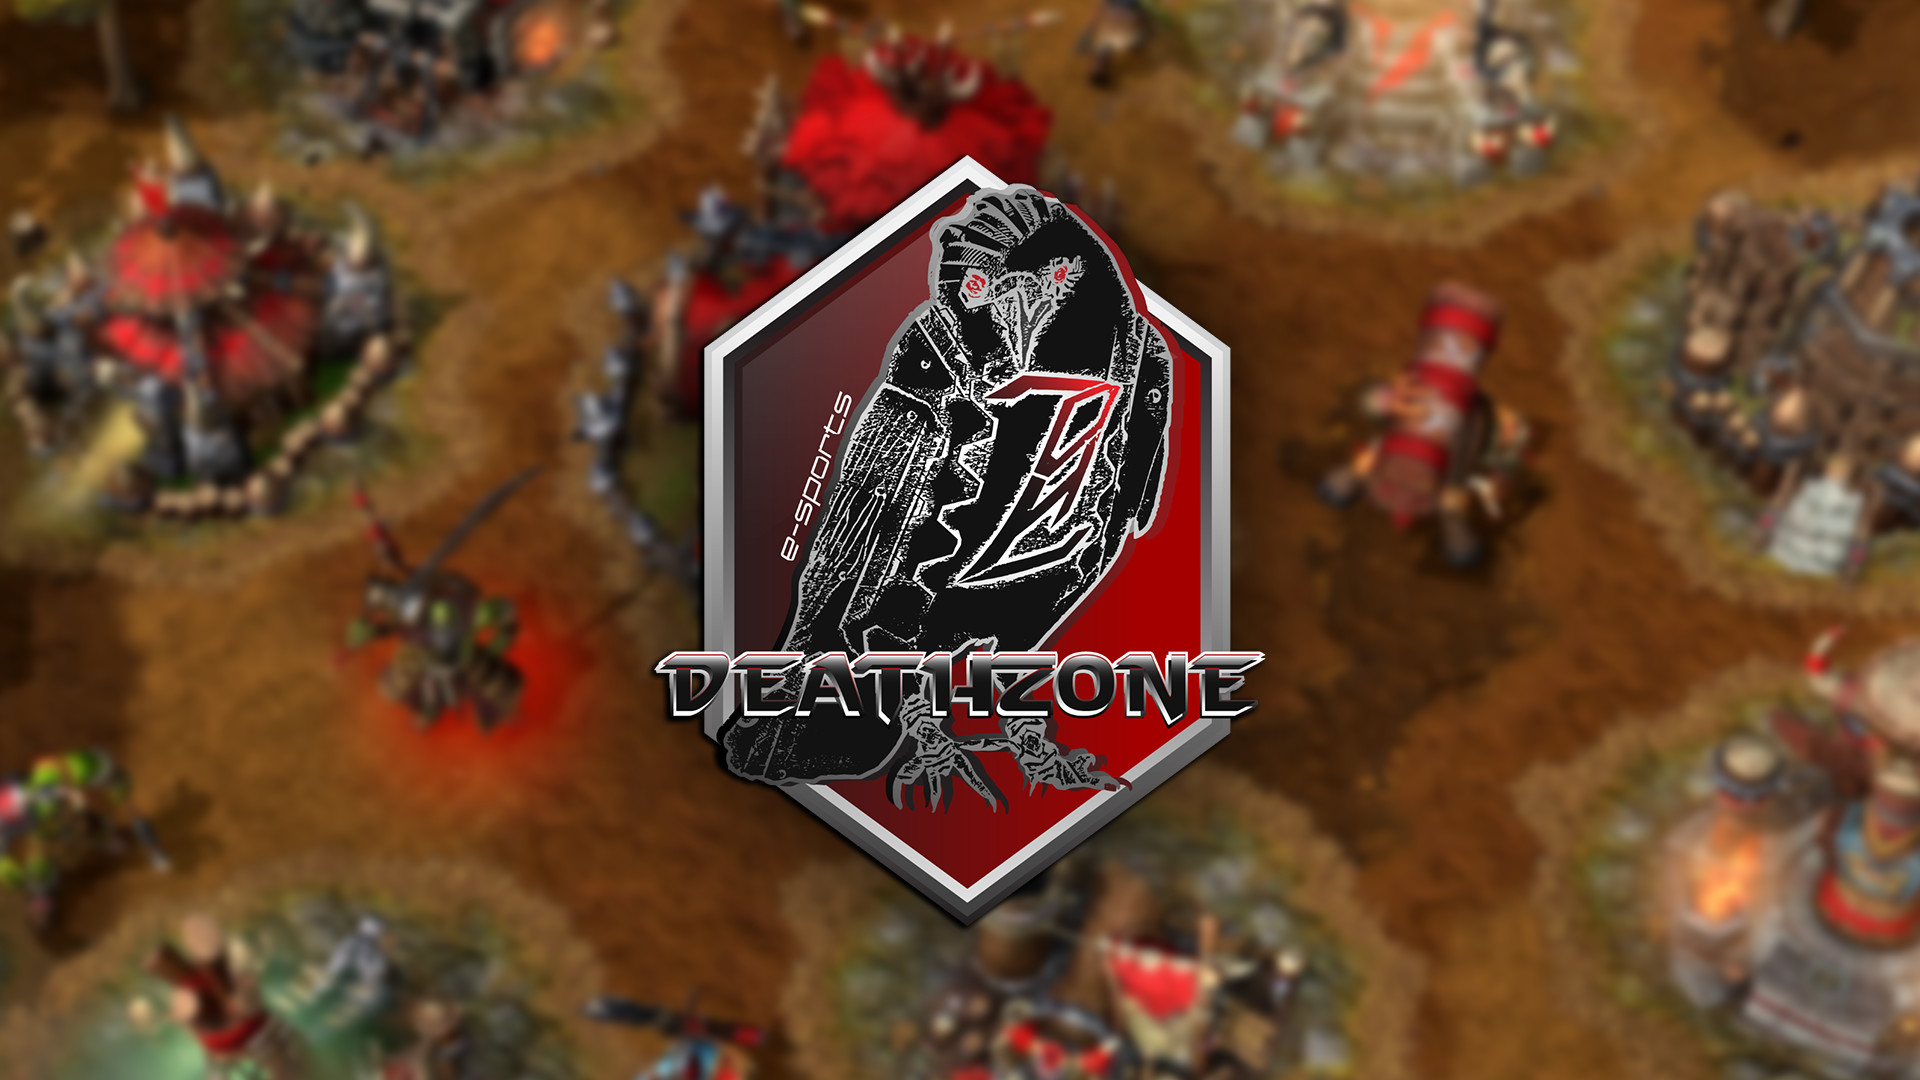 Warcraft 3 DeathZone